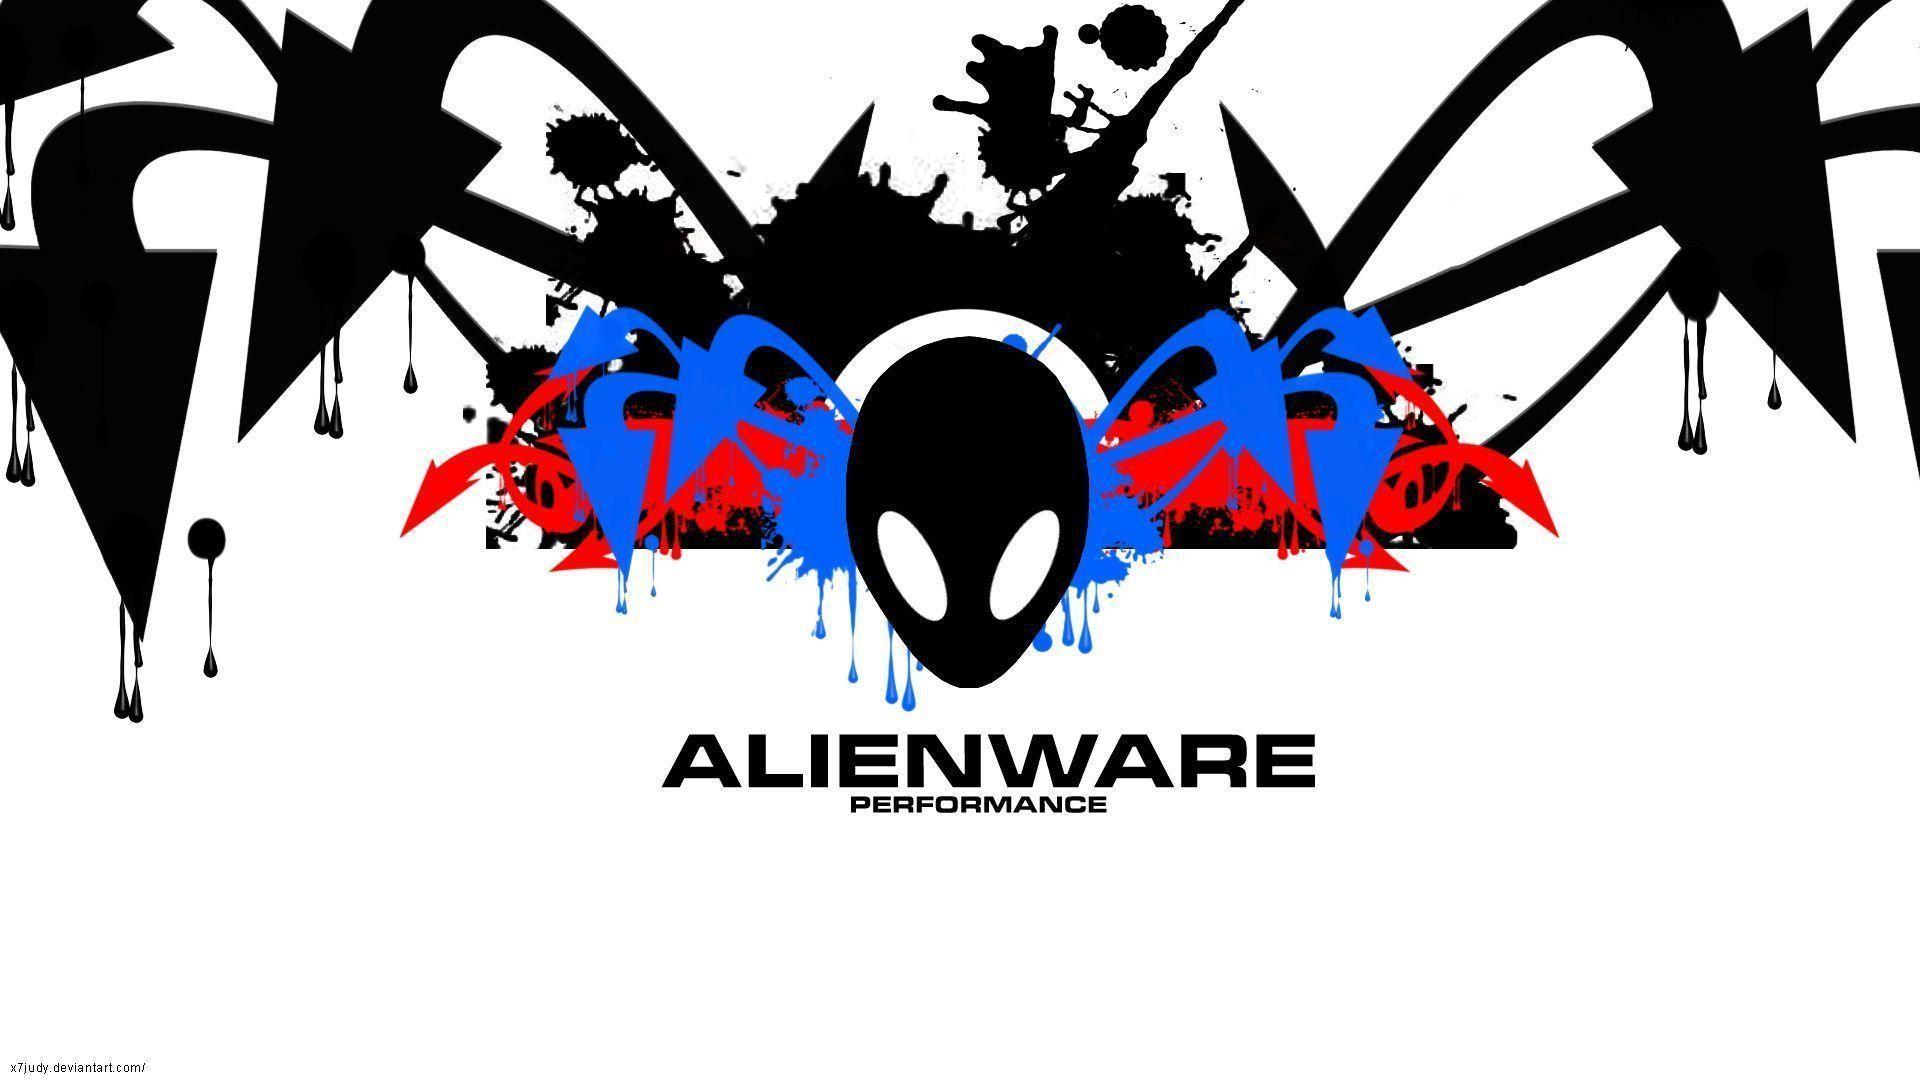 Alienware wallpapers for windows 7 wallpapersafari - 1920x1080 Alienware Wallpaper 72 Dpi Wallpapersafari